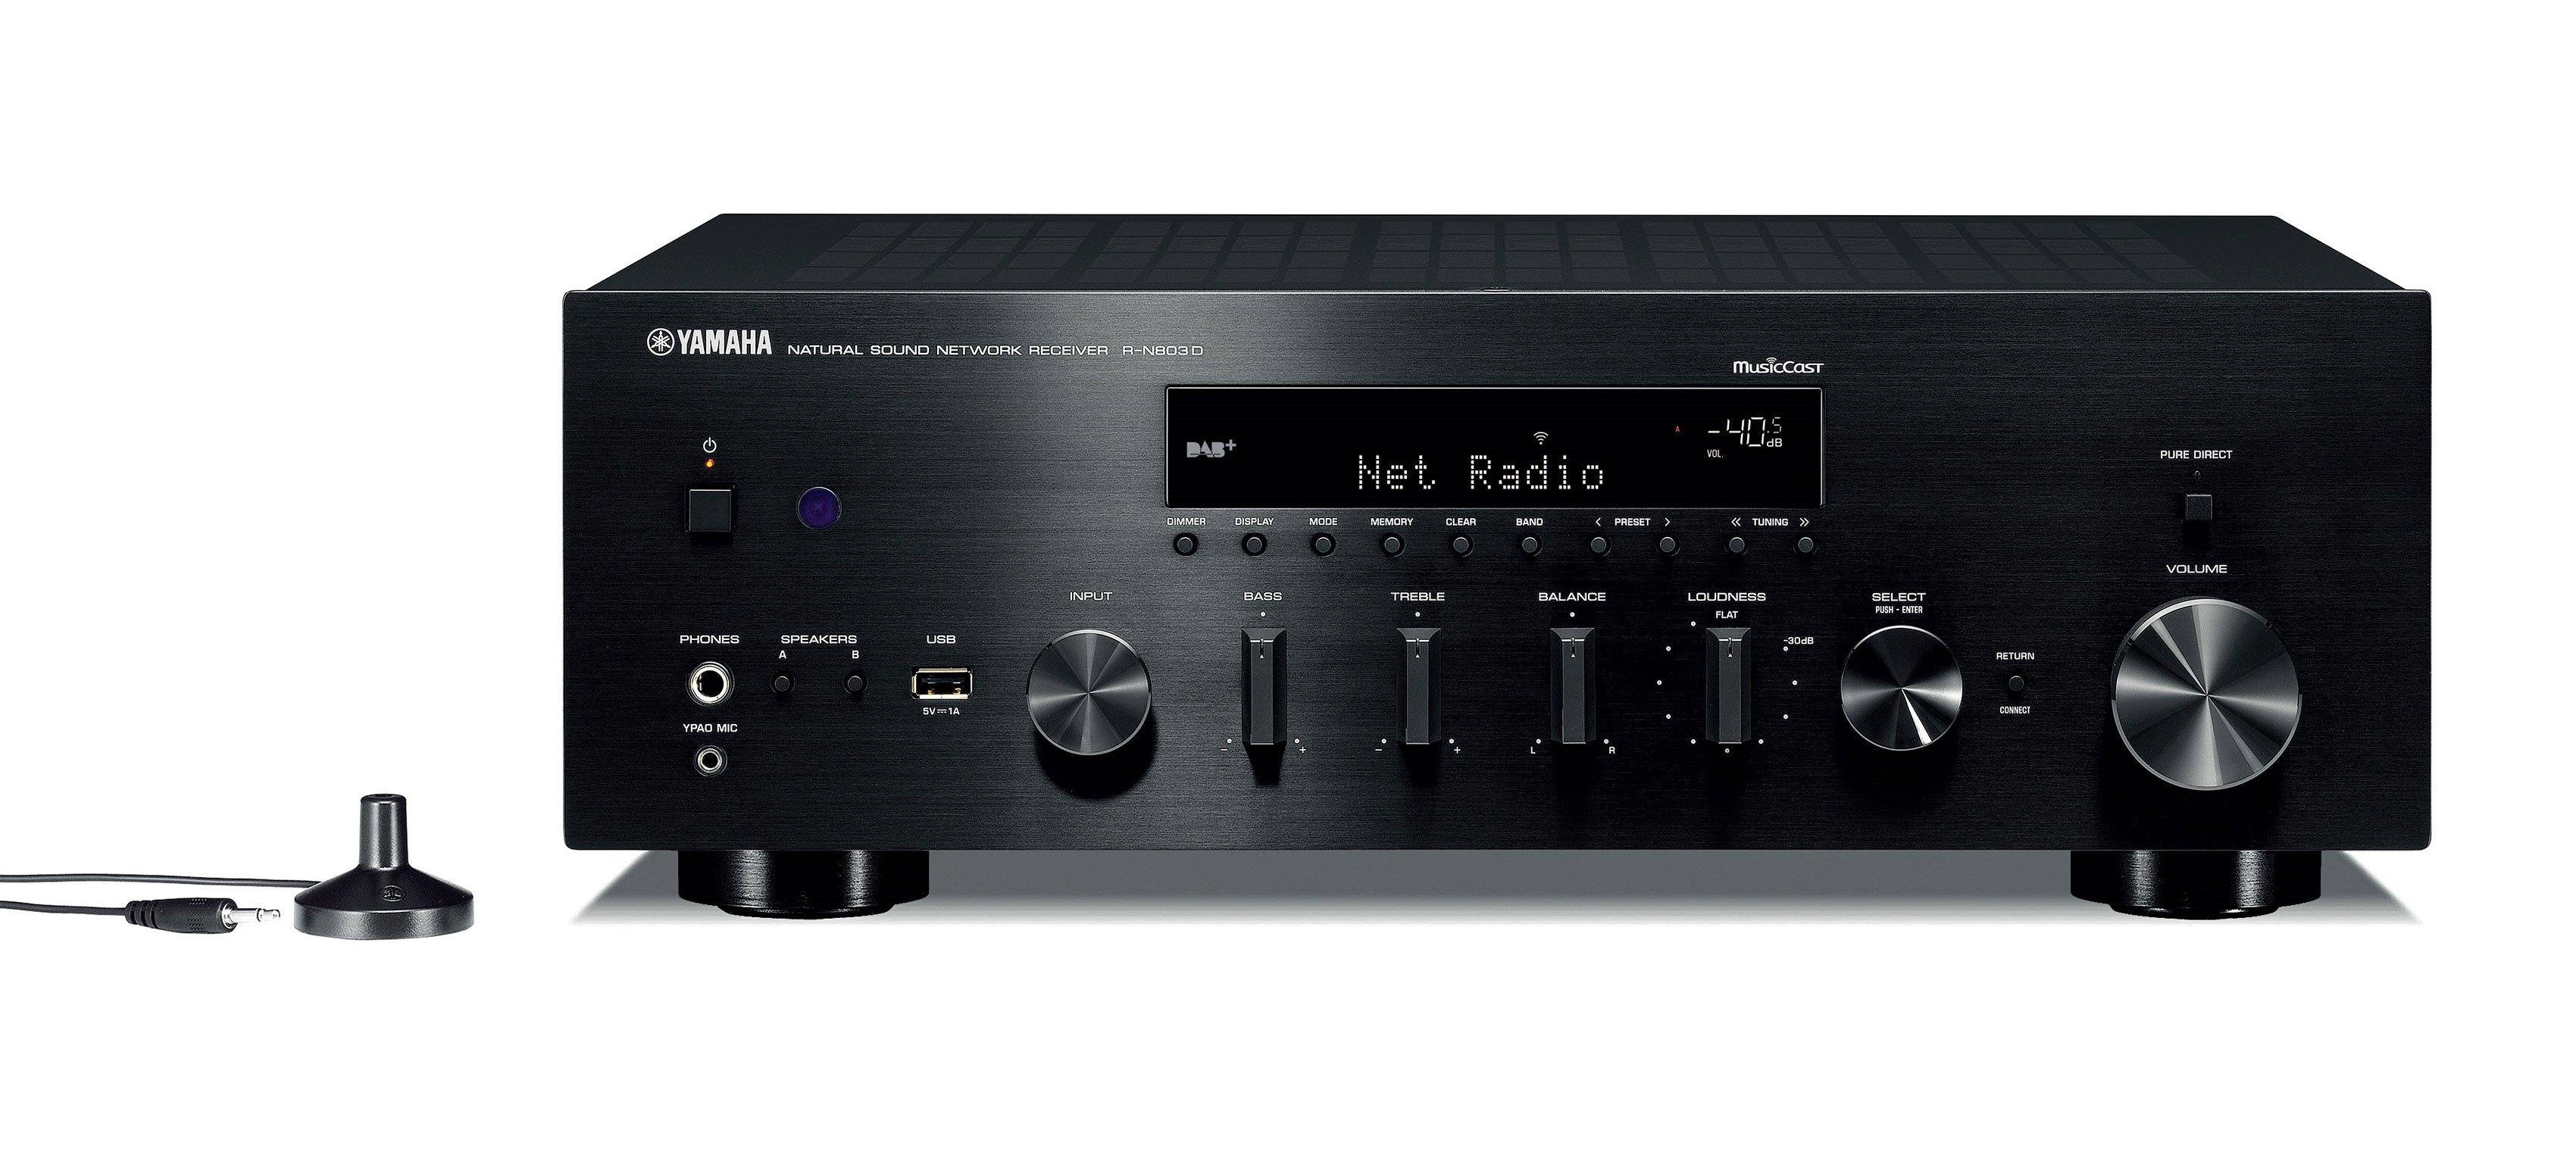 Yamaha rn803d musiccast sintoamplificatore stereo streamer e network player dolfi hi fi - Impianto wi fi per casa ...